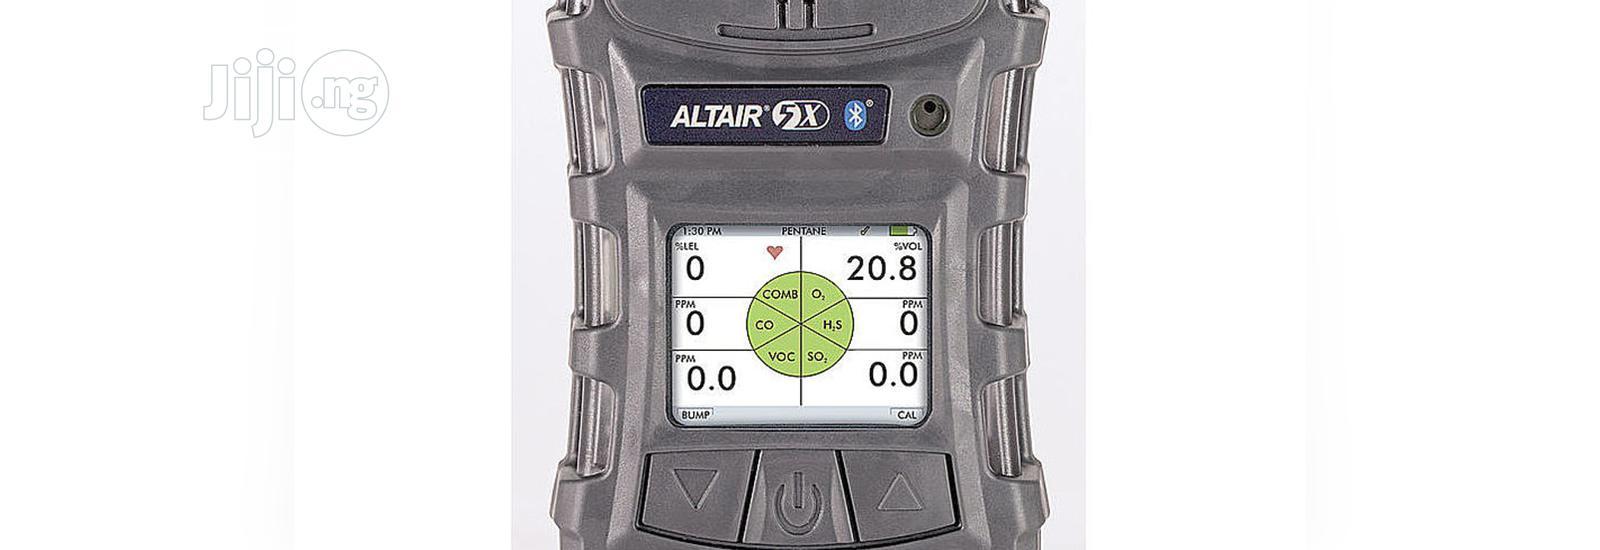 Msa Altair 5X Co2, Voc, So2, No2, Nh3 Gas Detector